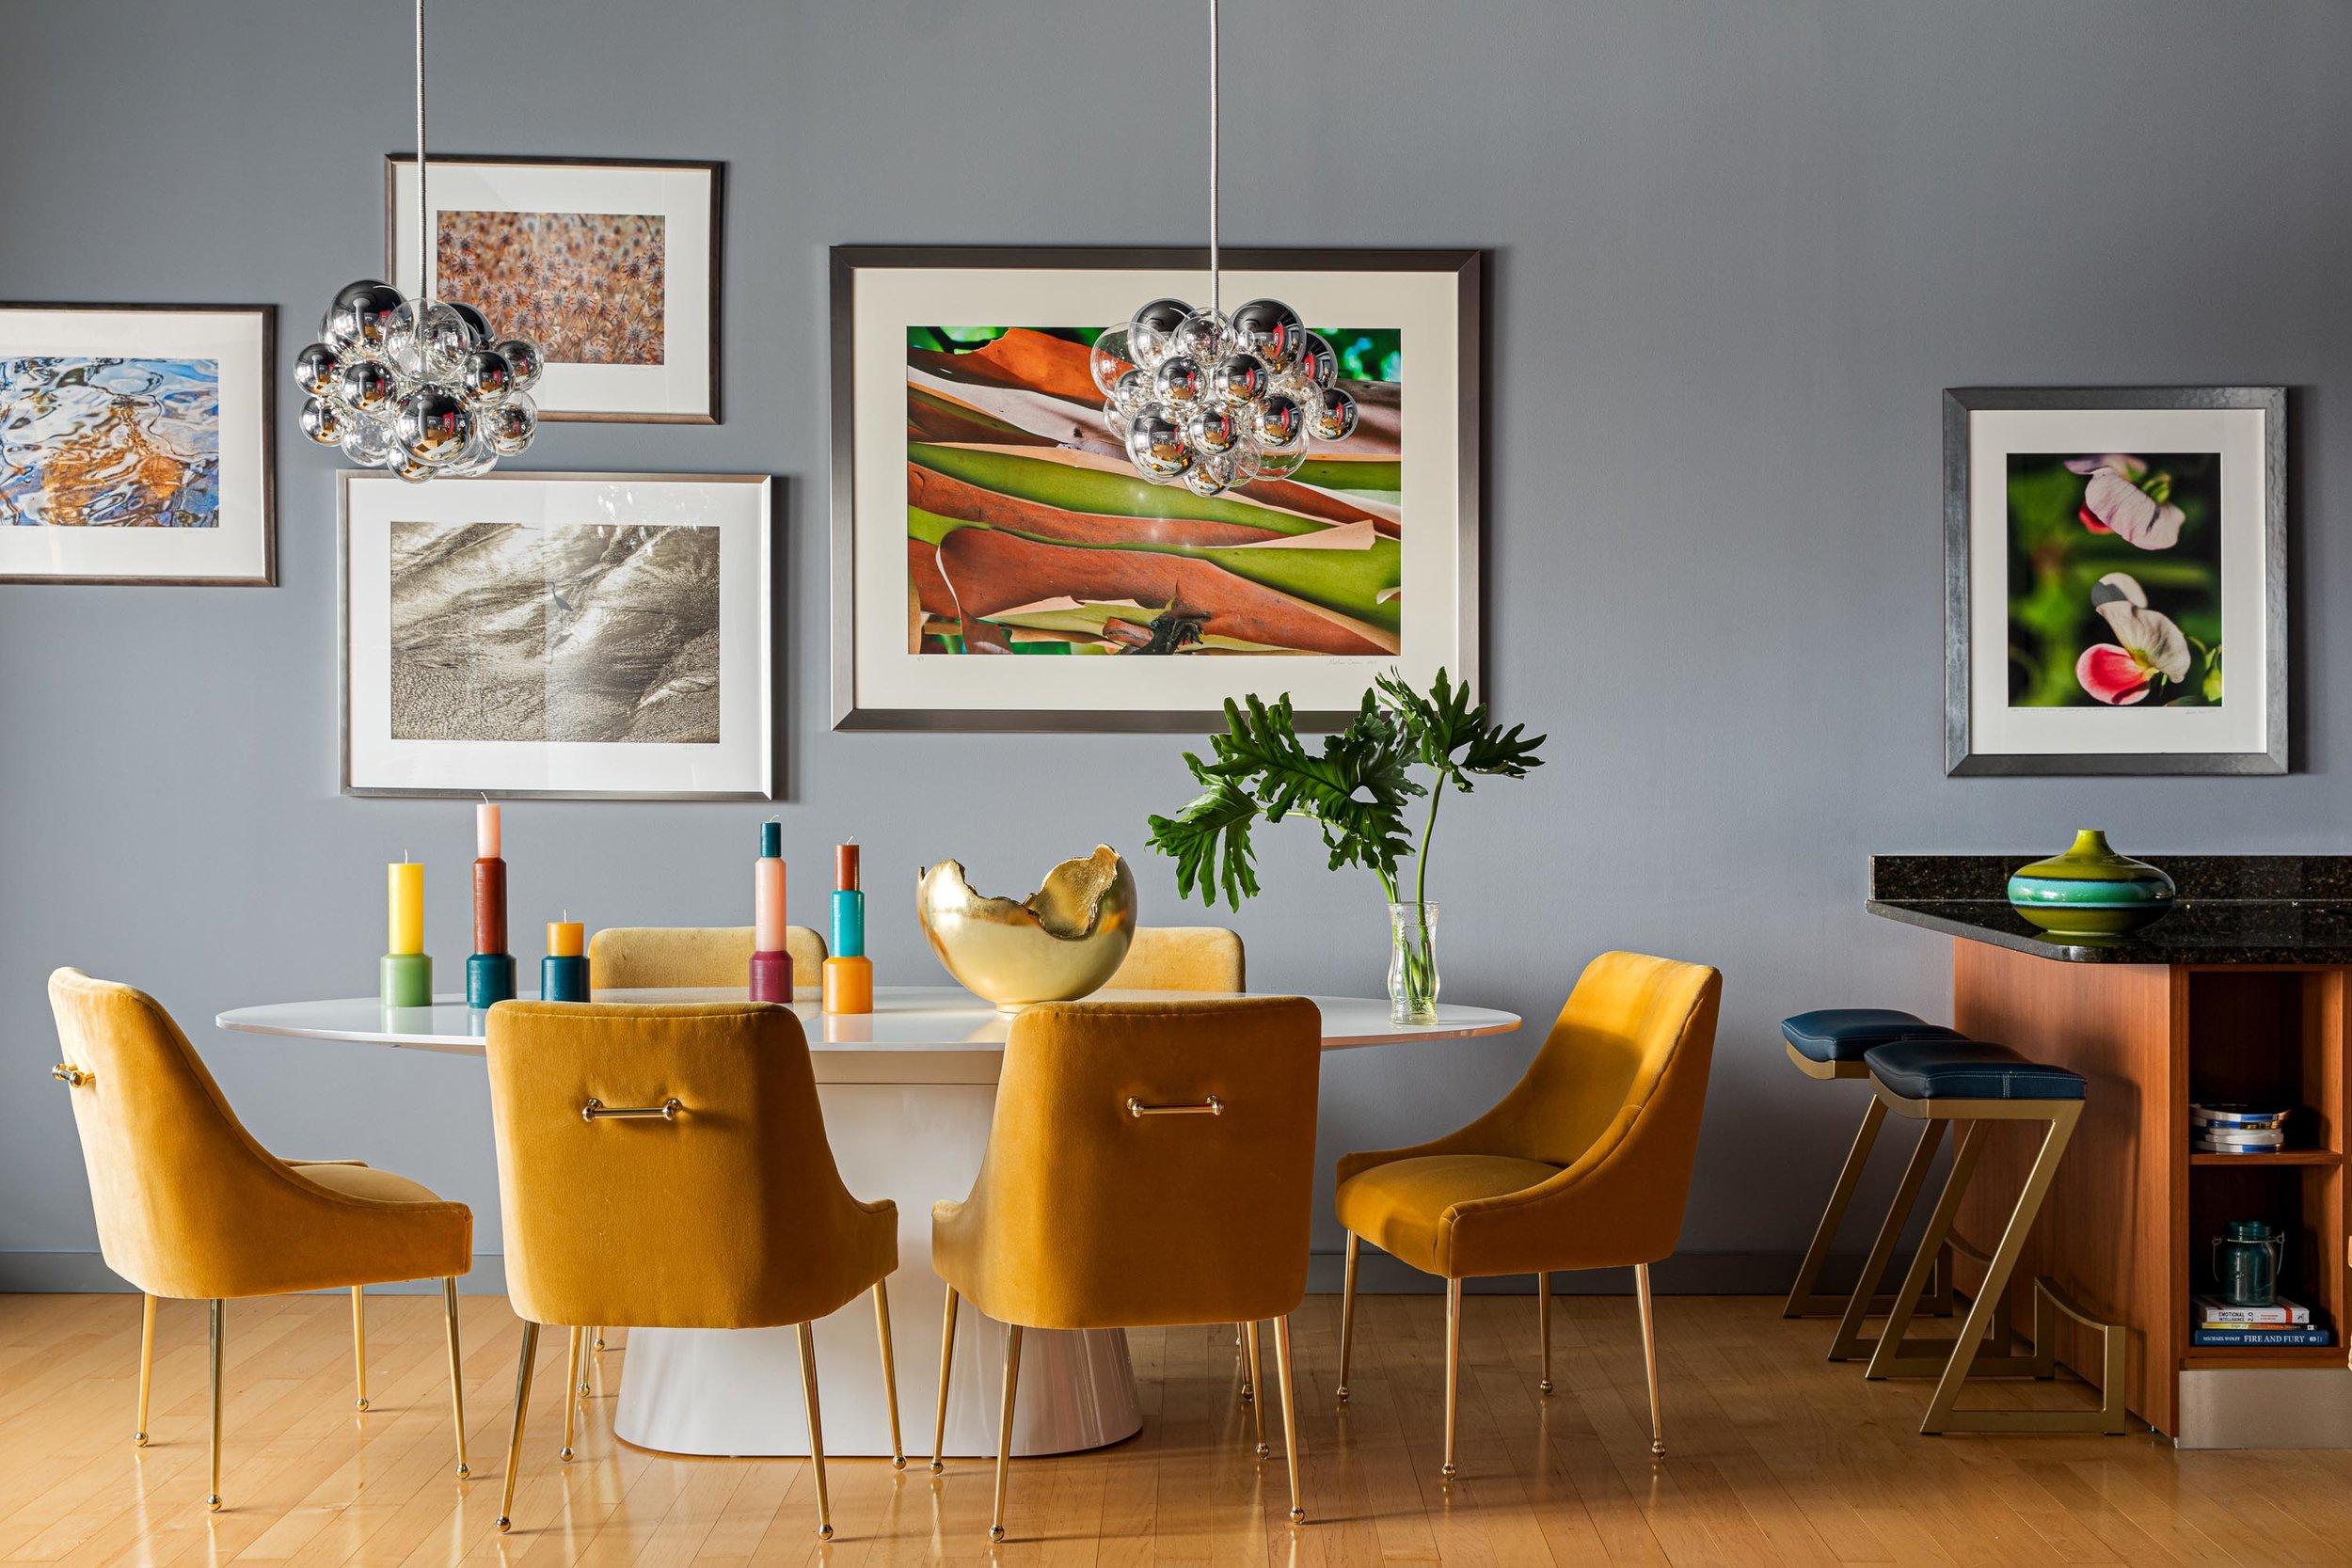 Boston dining room interior design by Dane Austin Design